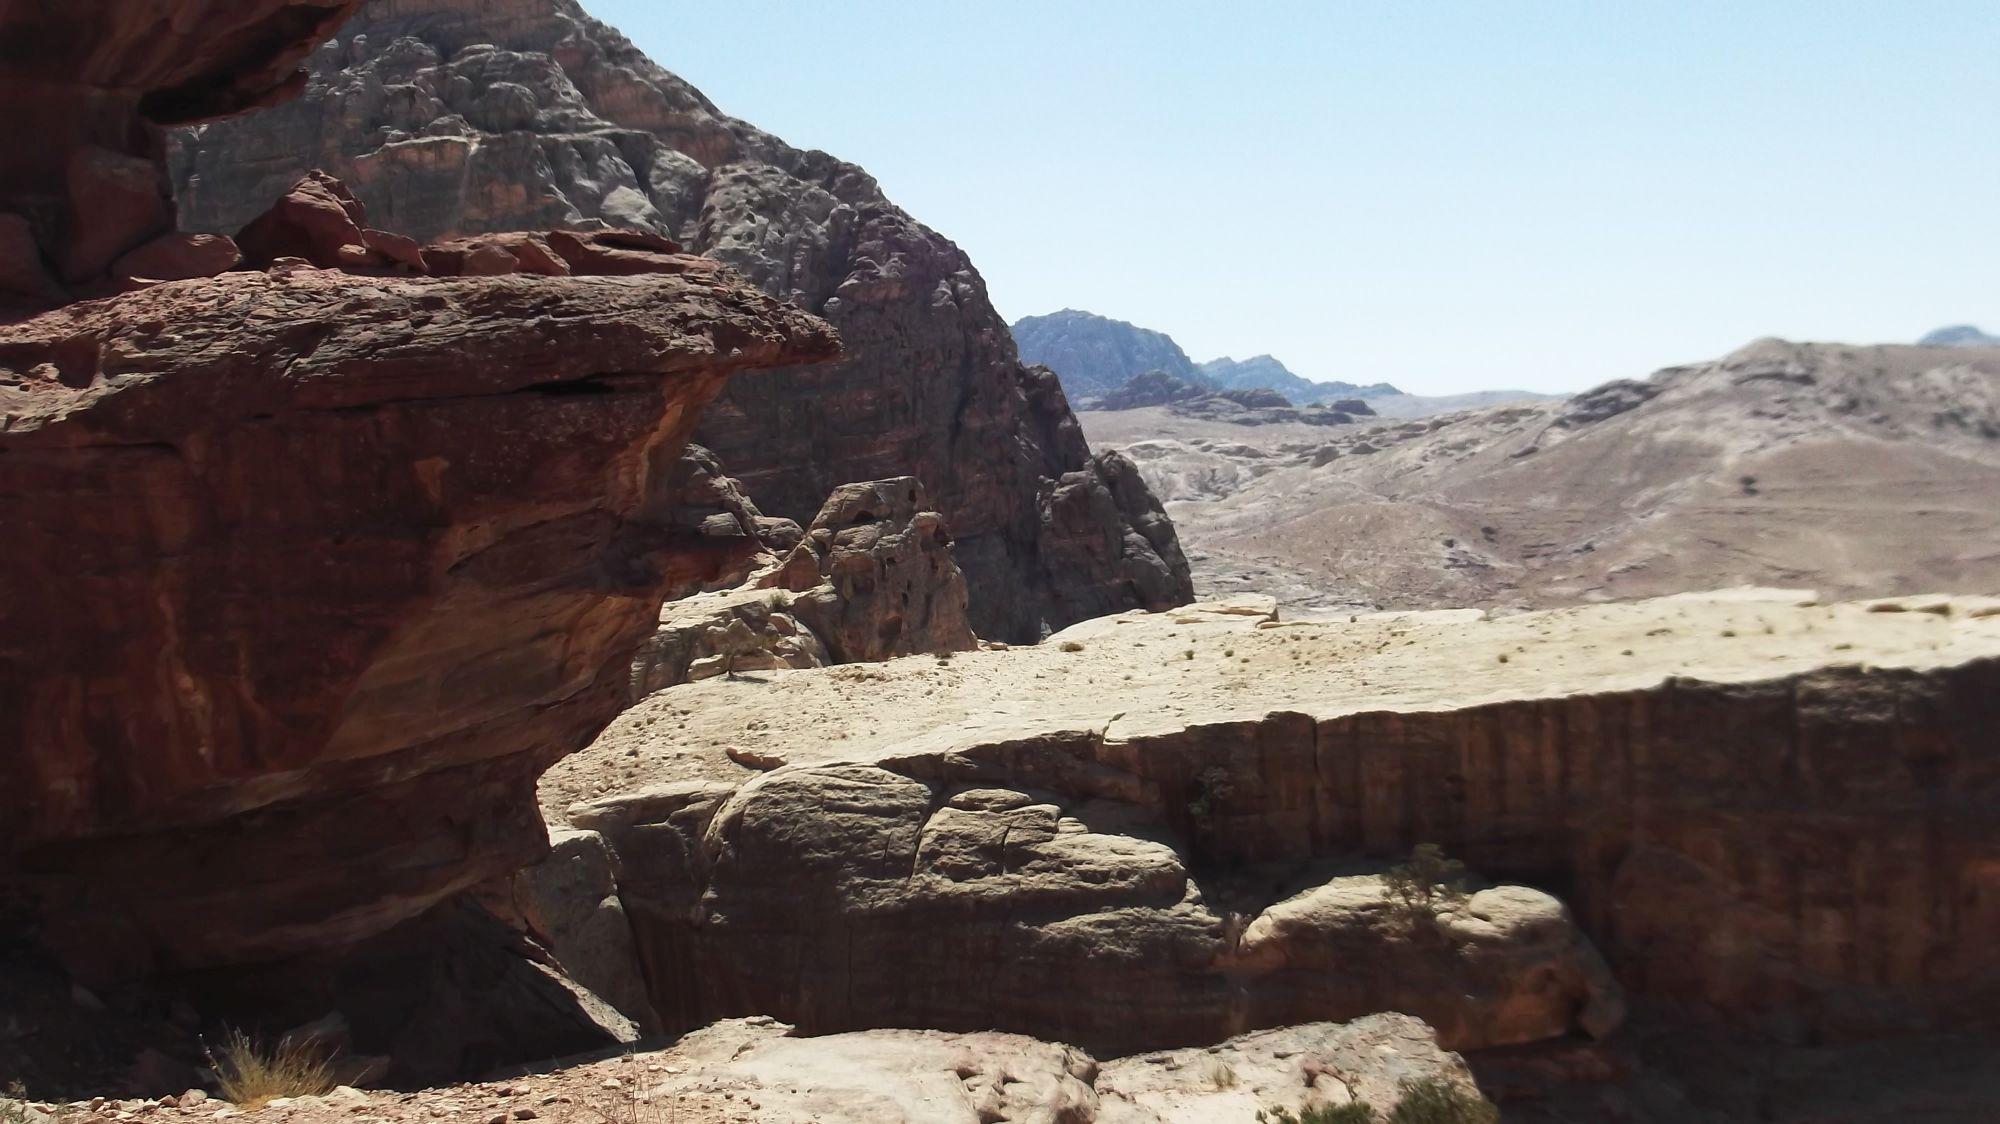 Jordania - Petra część 2 - zdjęcia, atrakcje